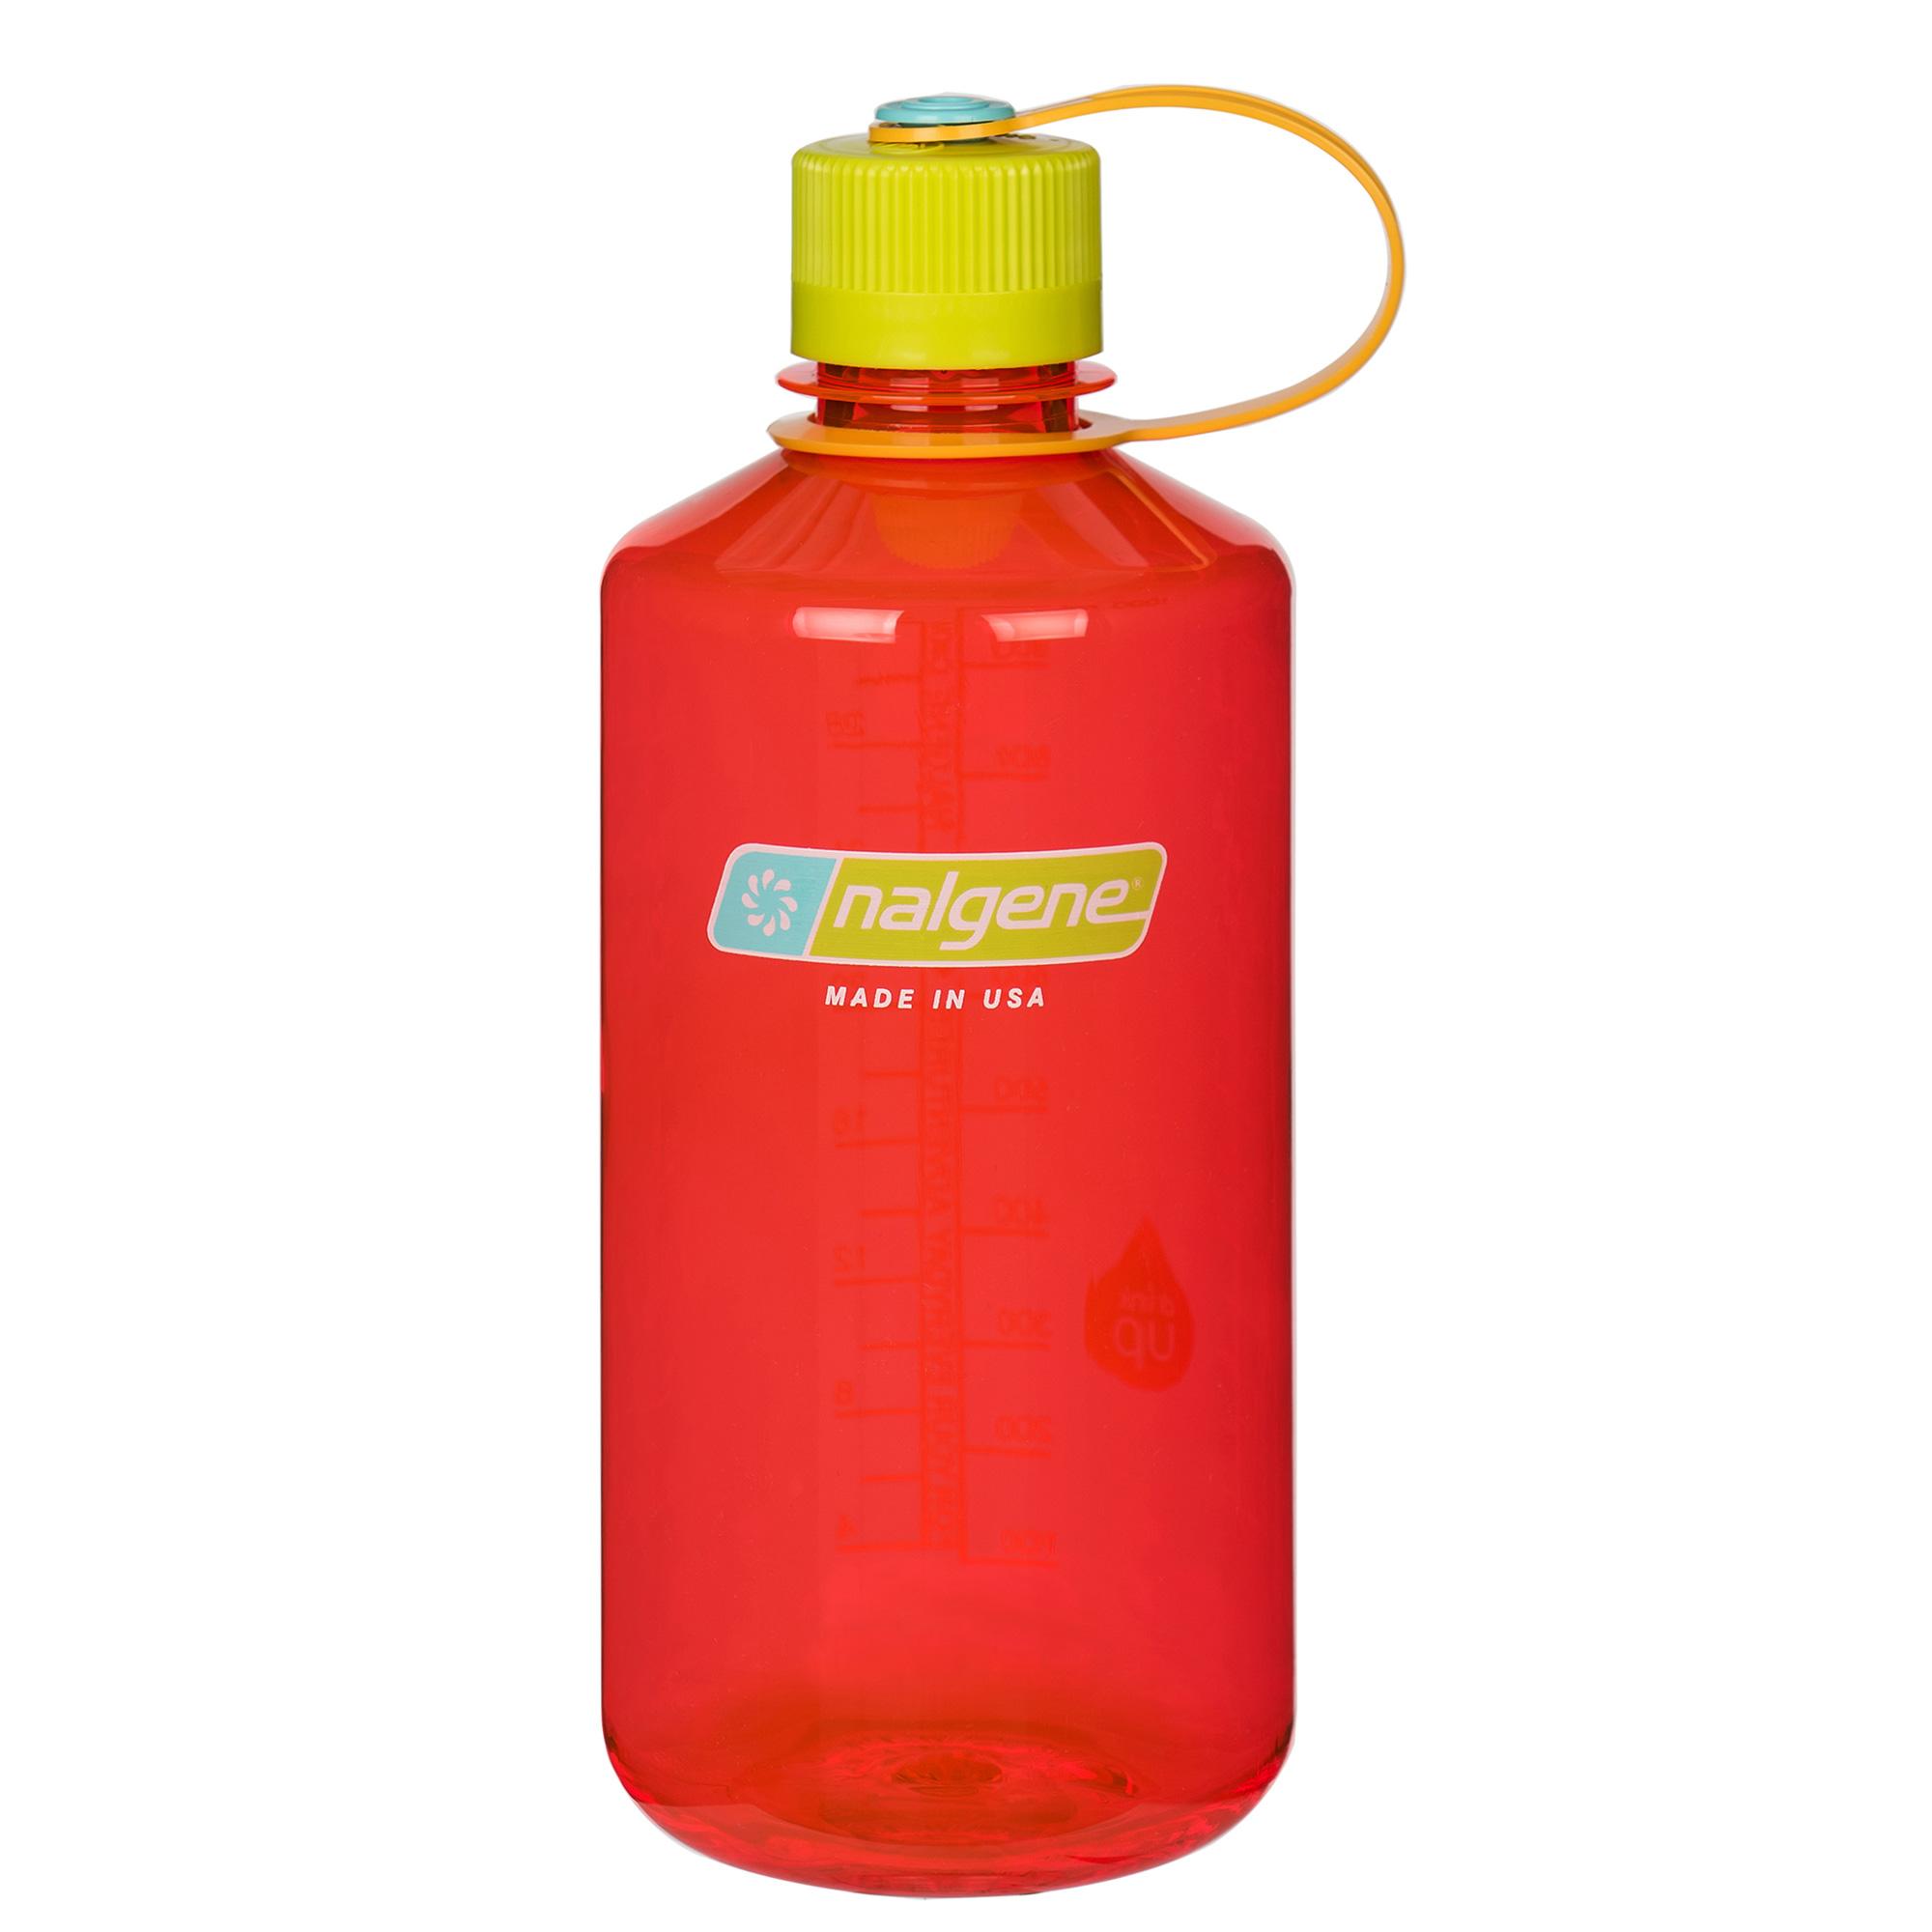 Nalgene Trinkflasche Enghals pomegranate 1 L